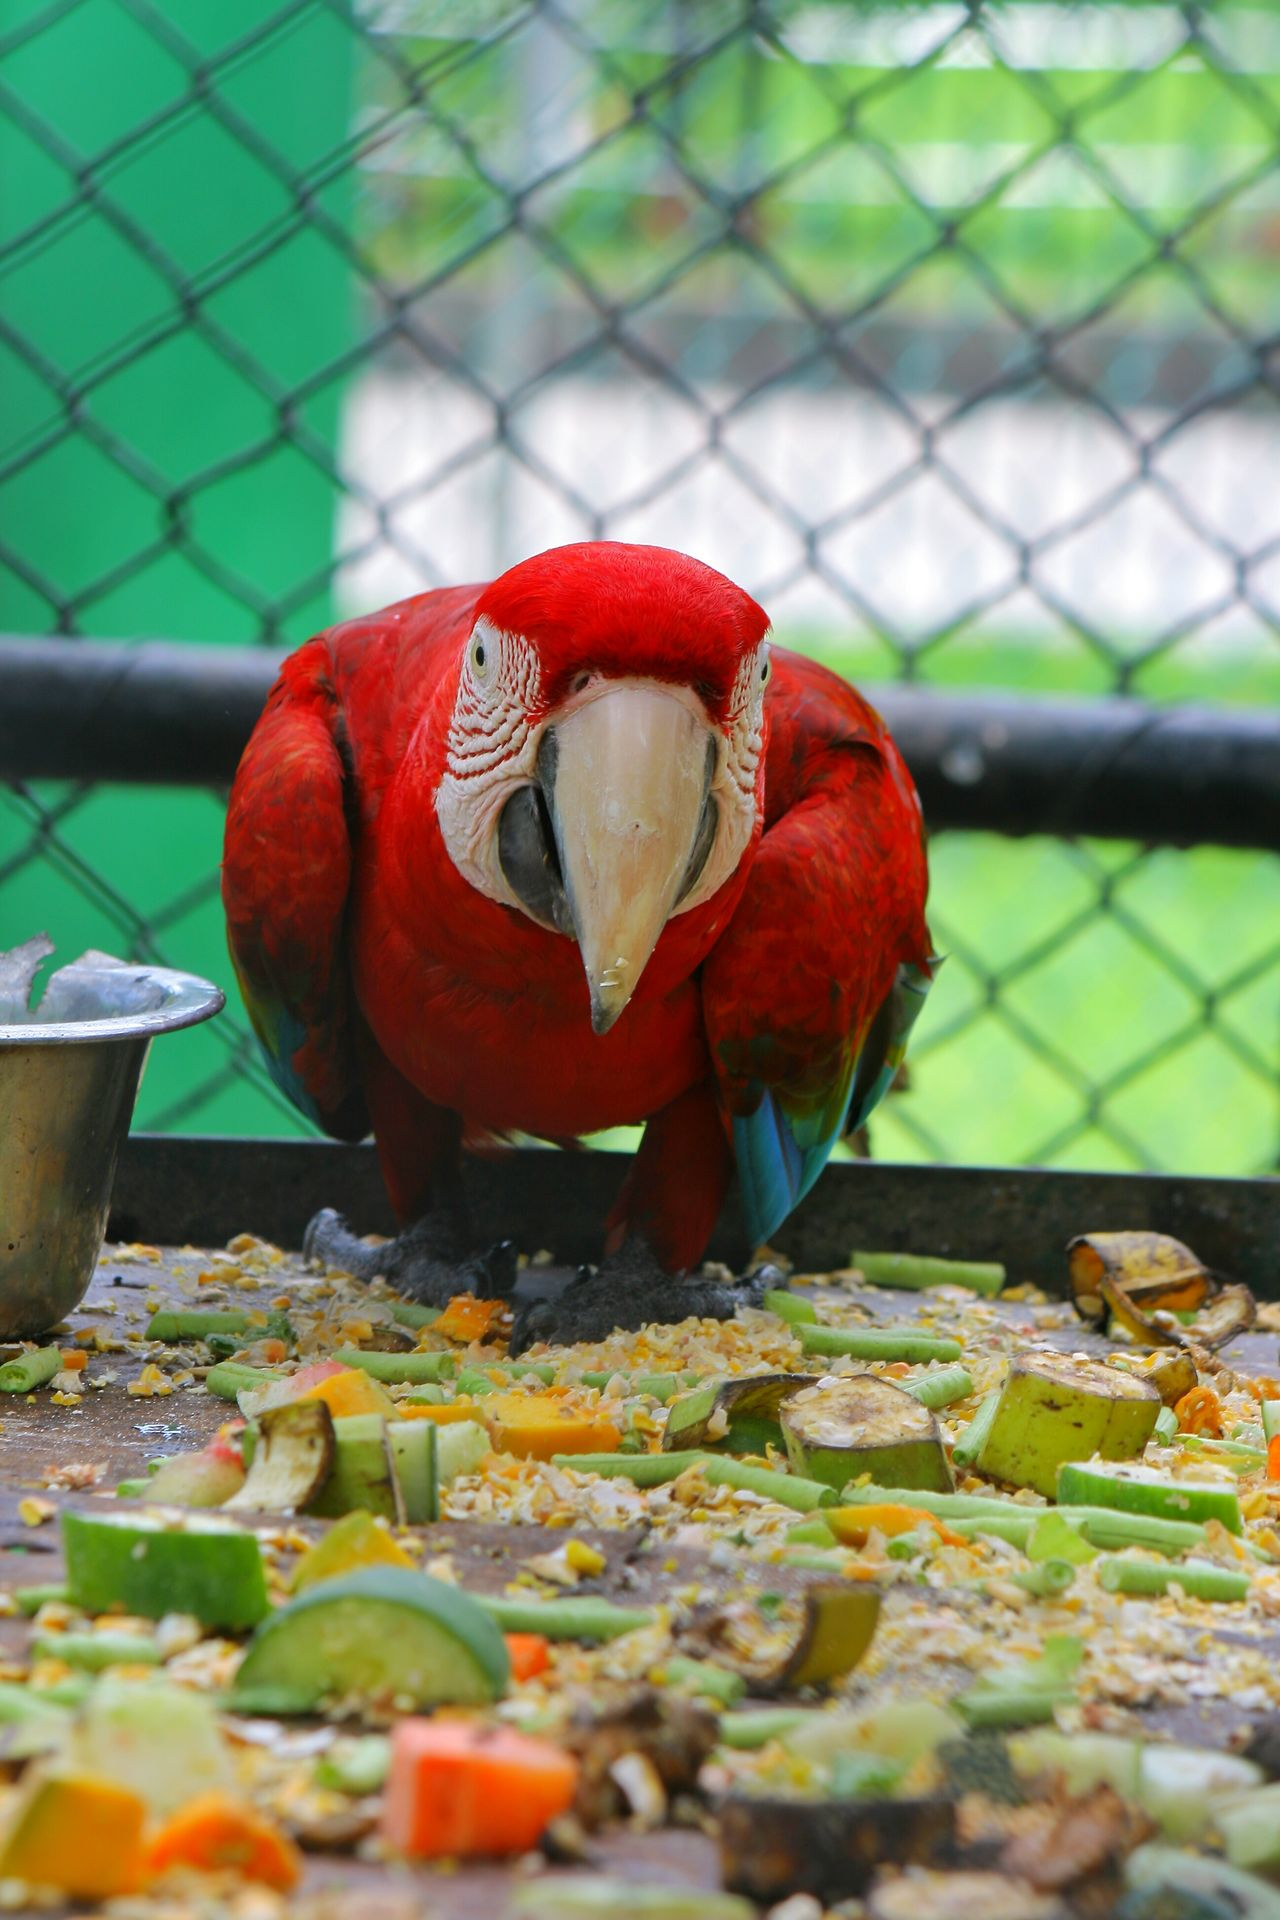 Trinidad And Tobago Relaxing Taking Photos Macau Emperorvalleyzoo Zoo Photography  Zoophotography Birds🐦⛅ Bird Photography Bird Posing Bird Portrait